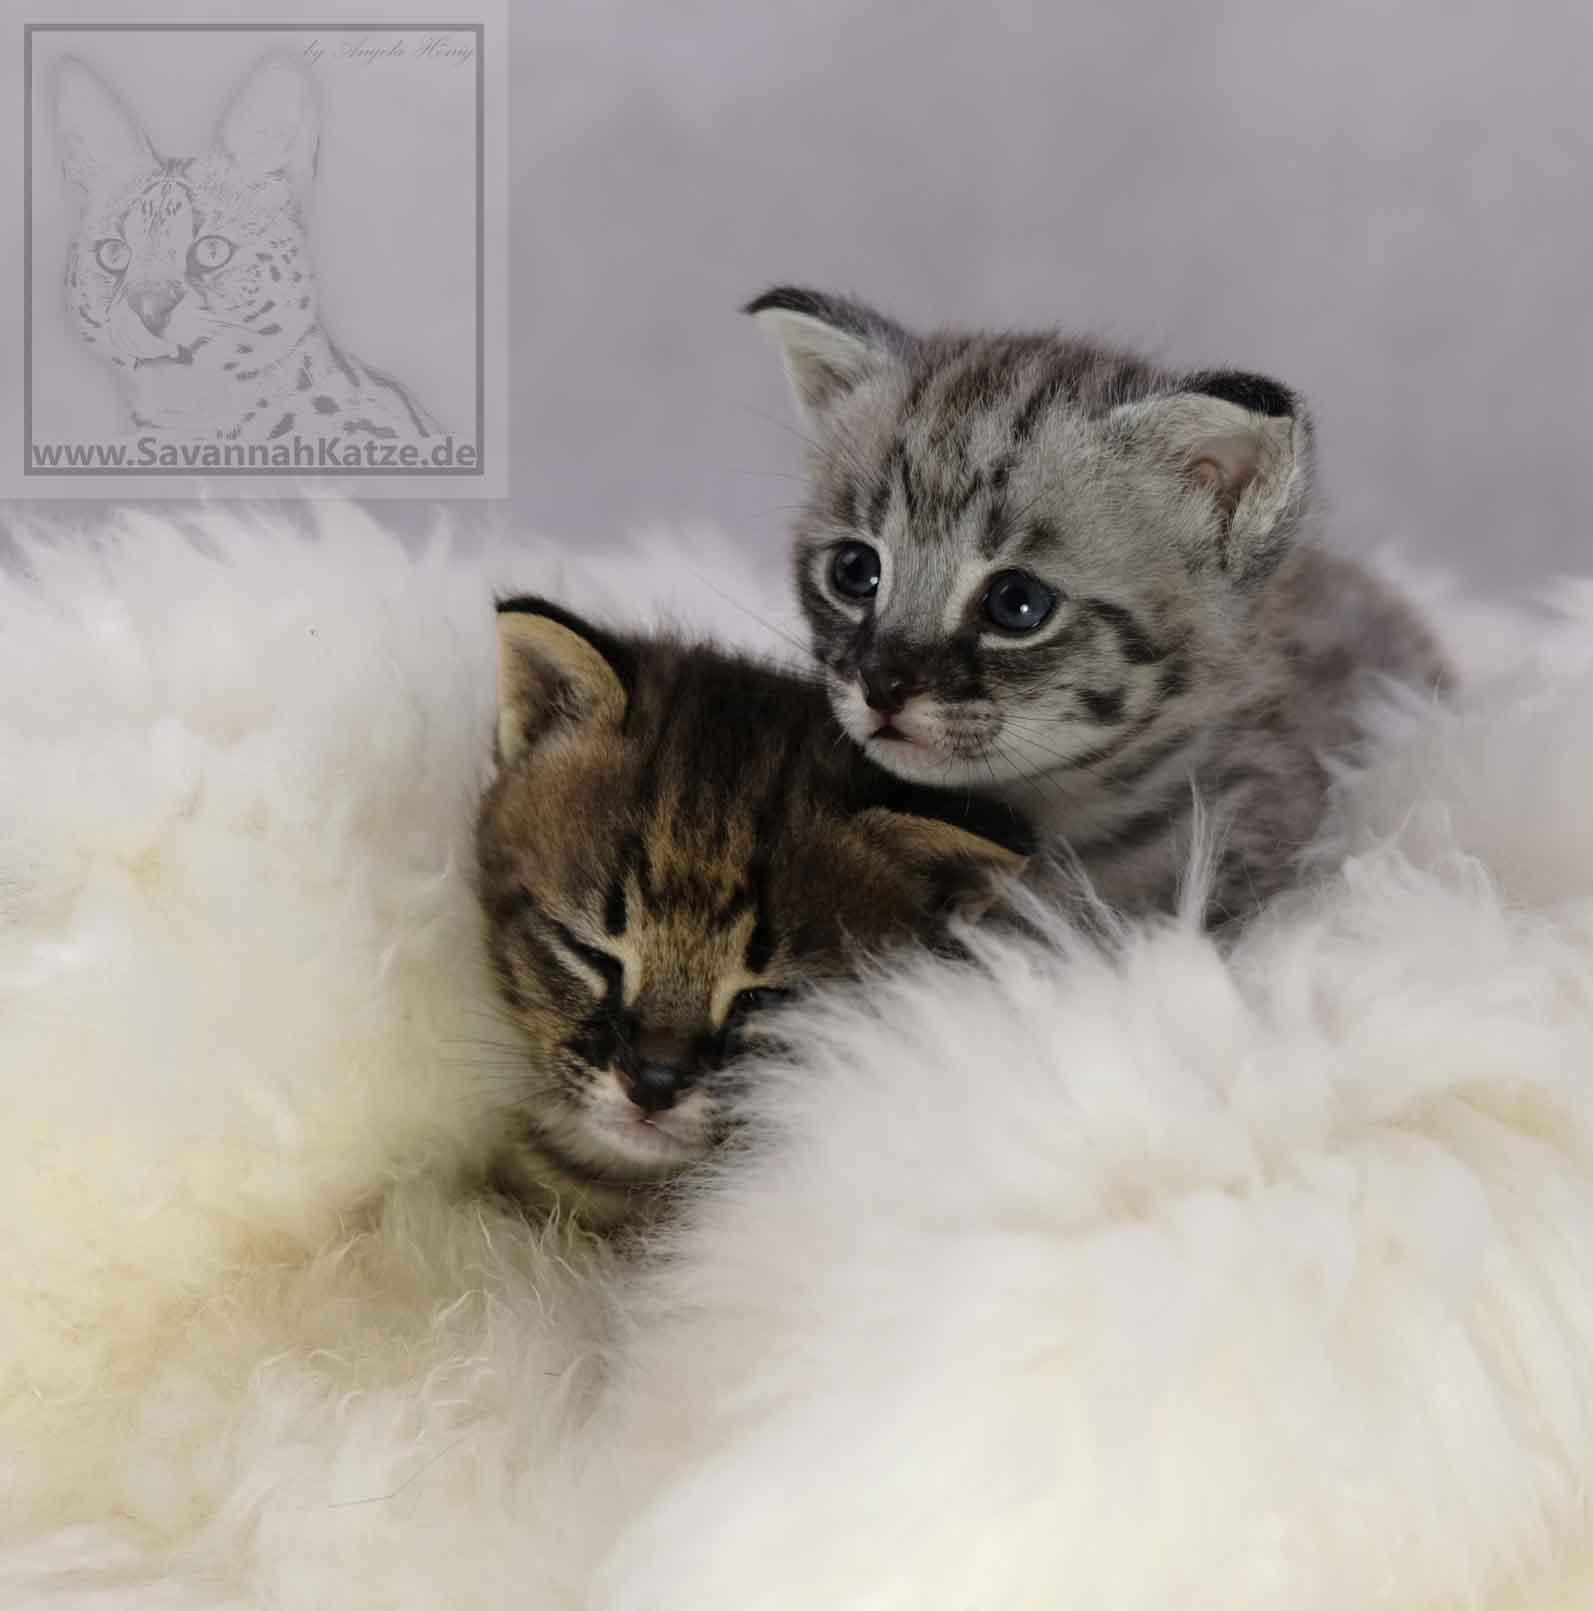 savannah katzen abzugeben of jambo savannah cats. Black Bedroom Furniture Sets. Home Design Ideas